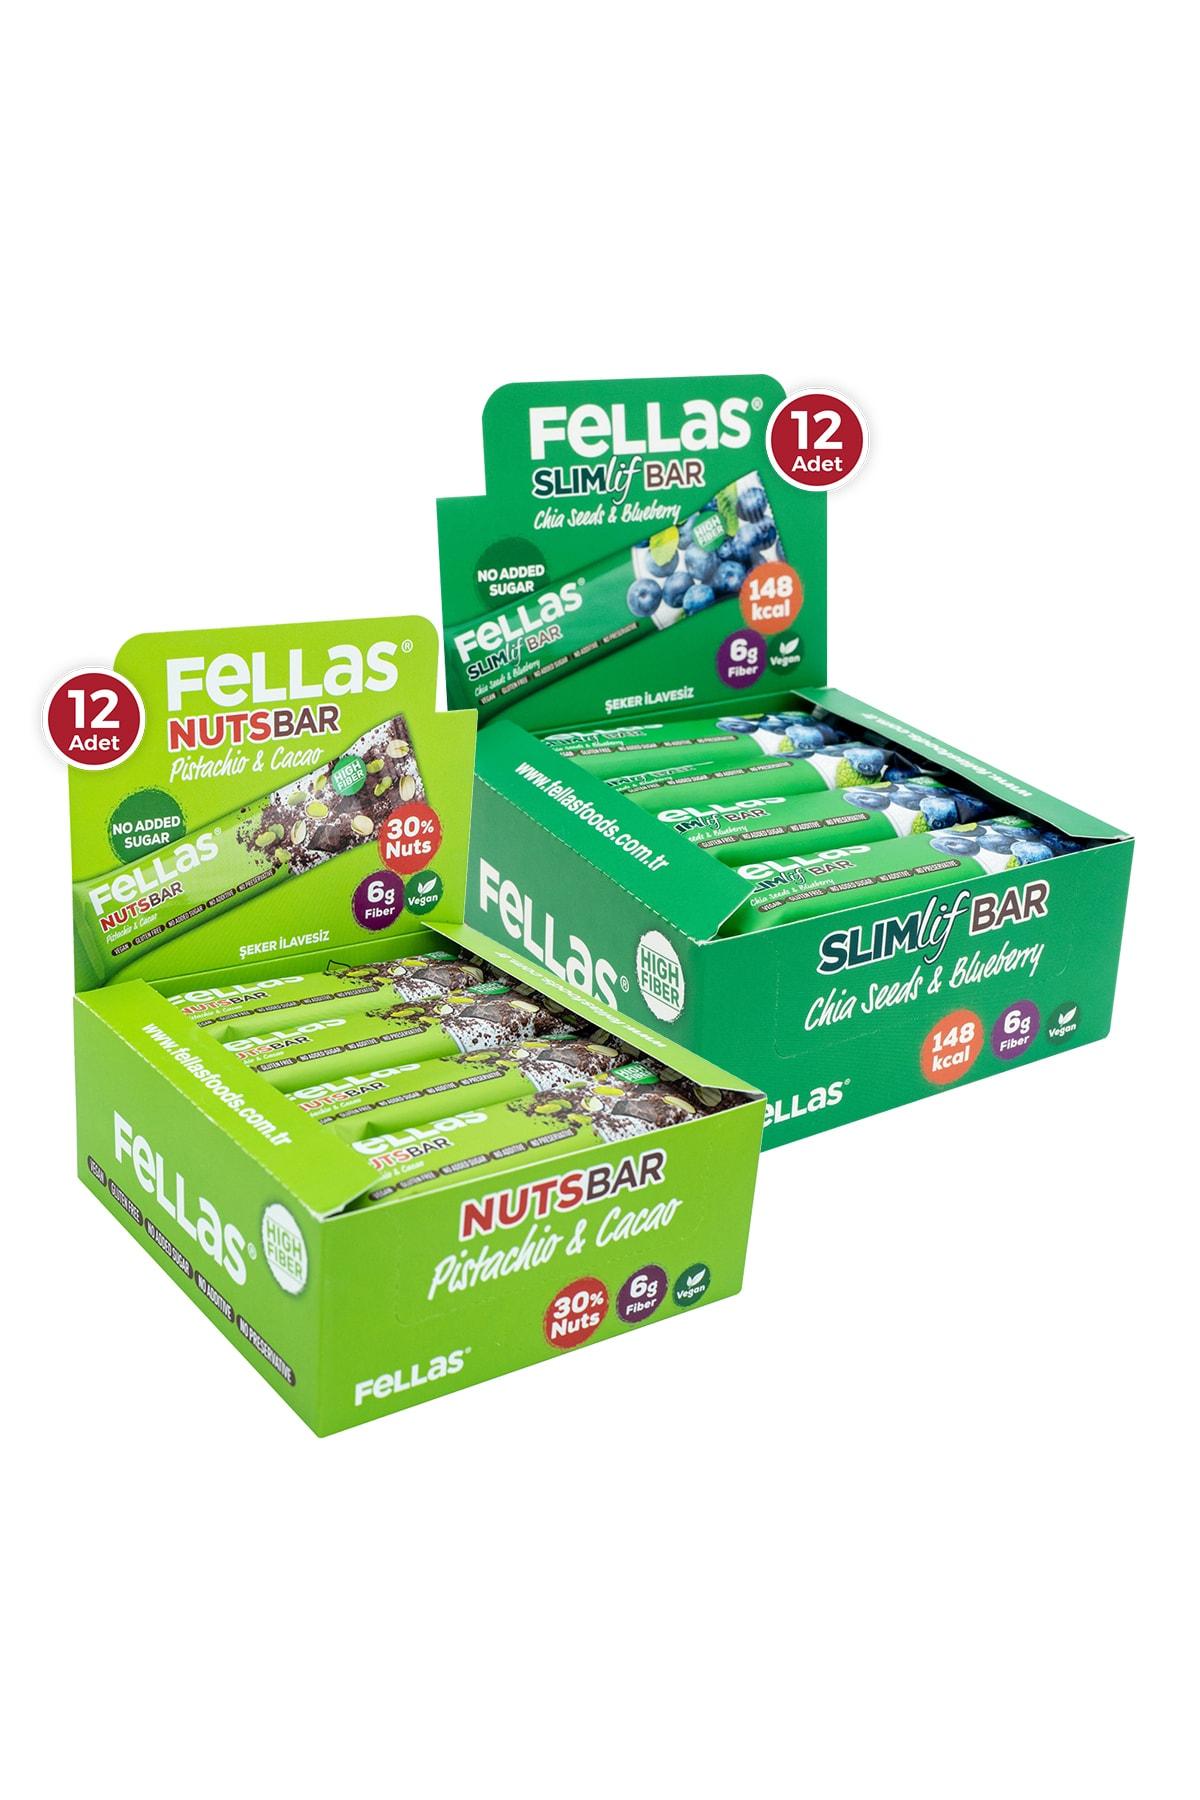 Fellas Meyve Bar 40 G Süper Ikili Kutu 24 Adet - Antep Fıstıklı X 12 Adet + Yaban Mersini X 12 Adet 1